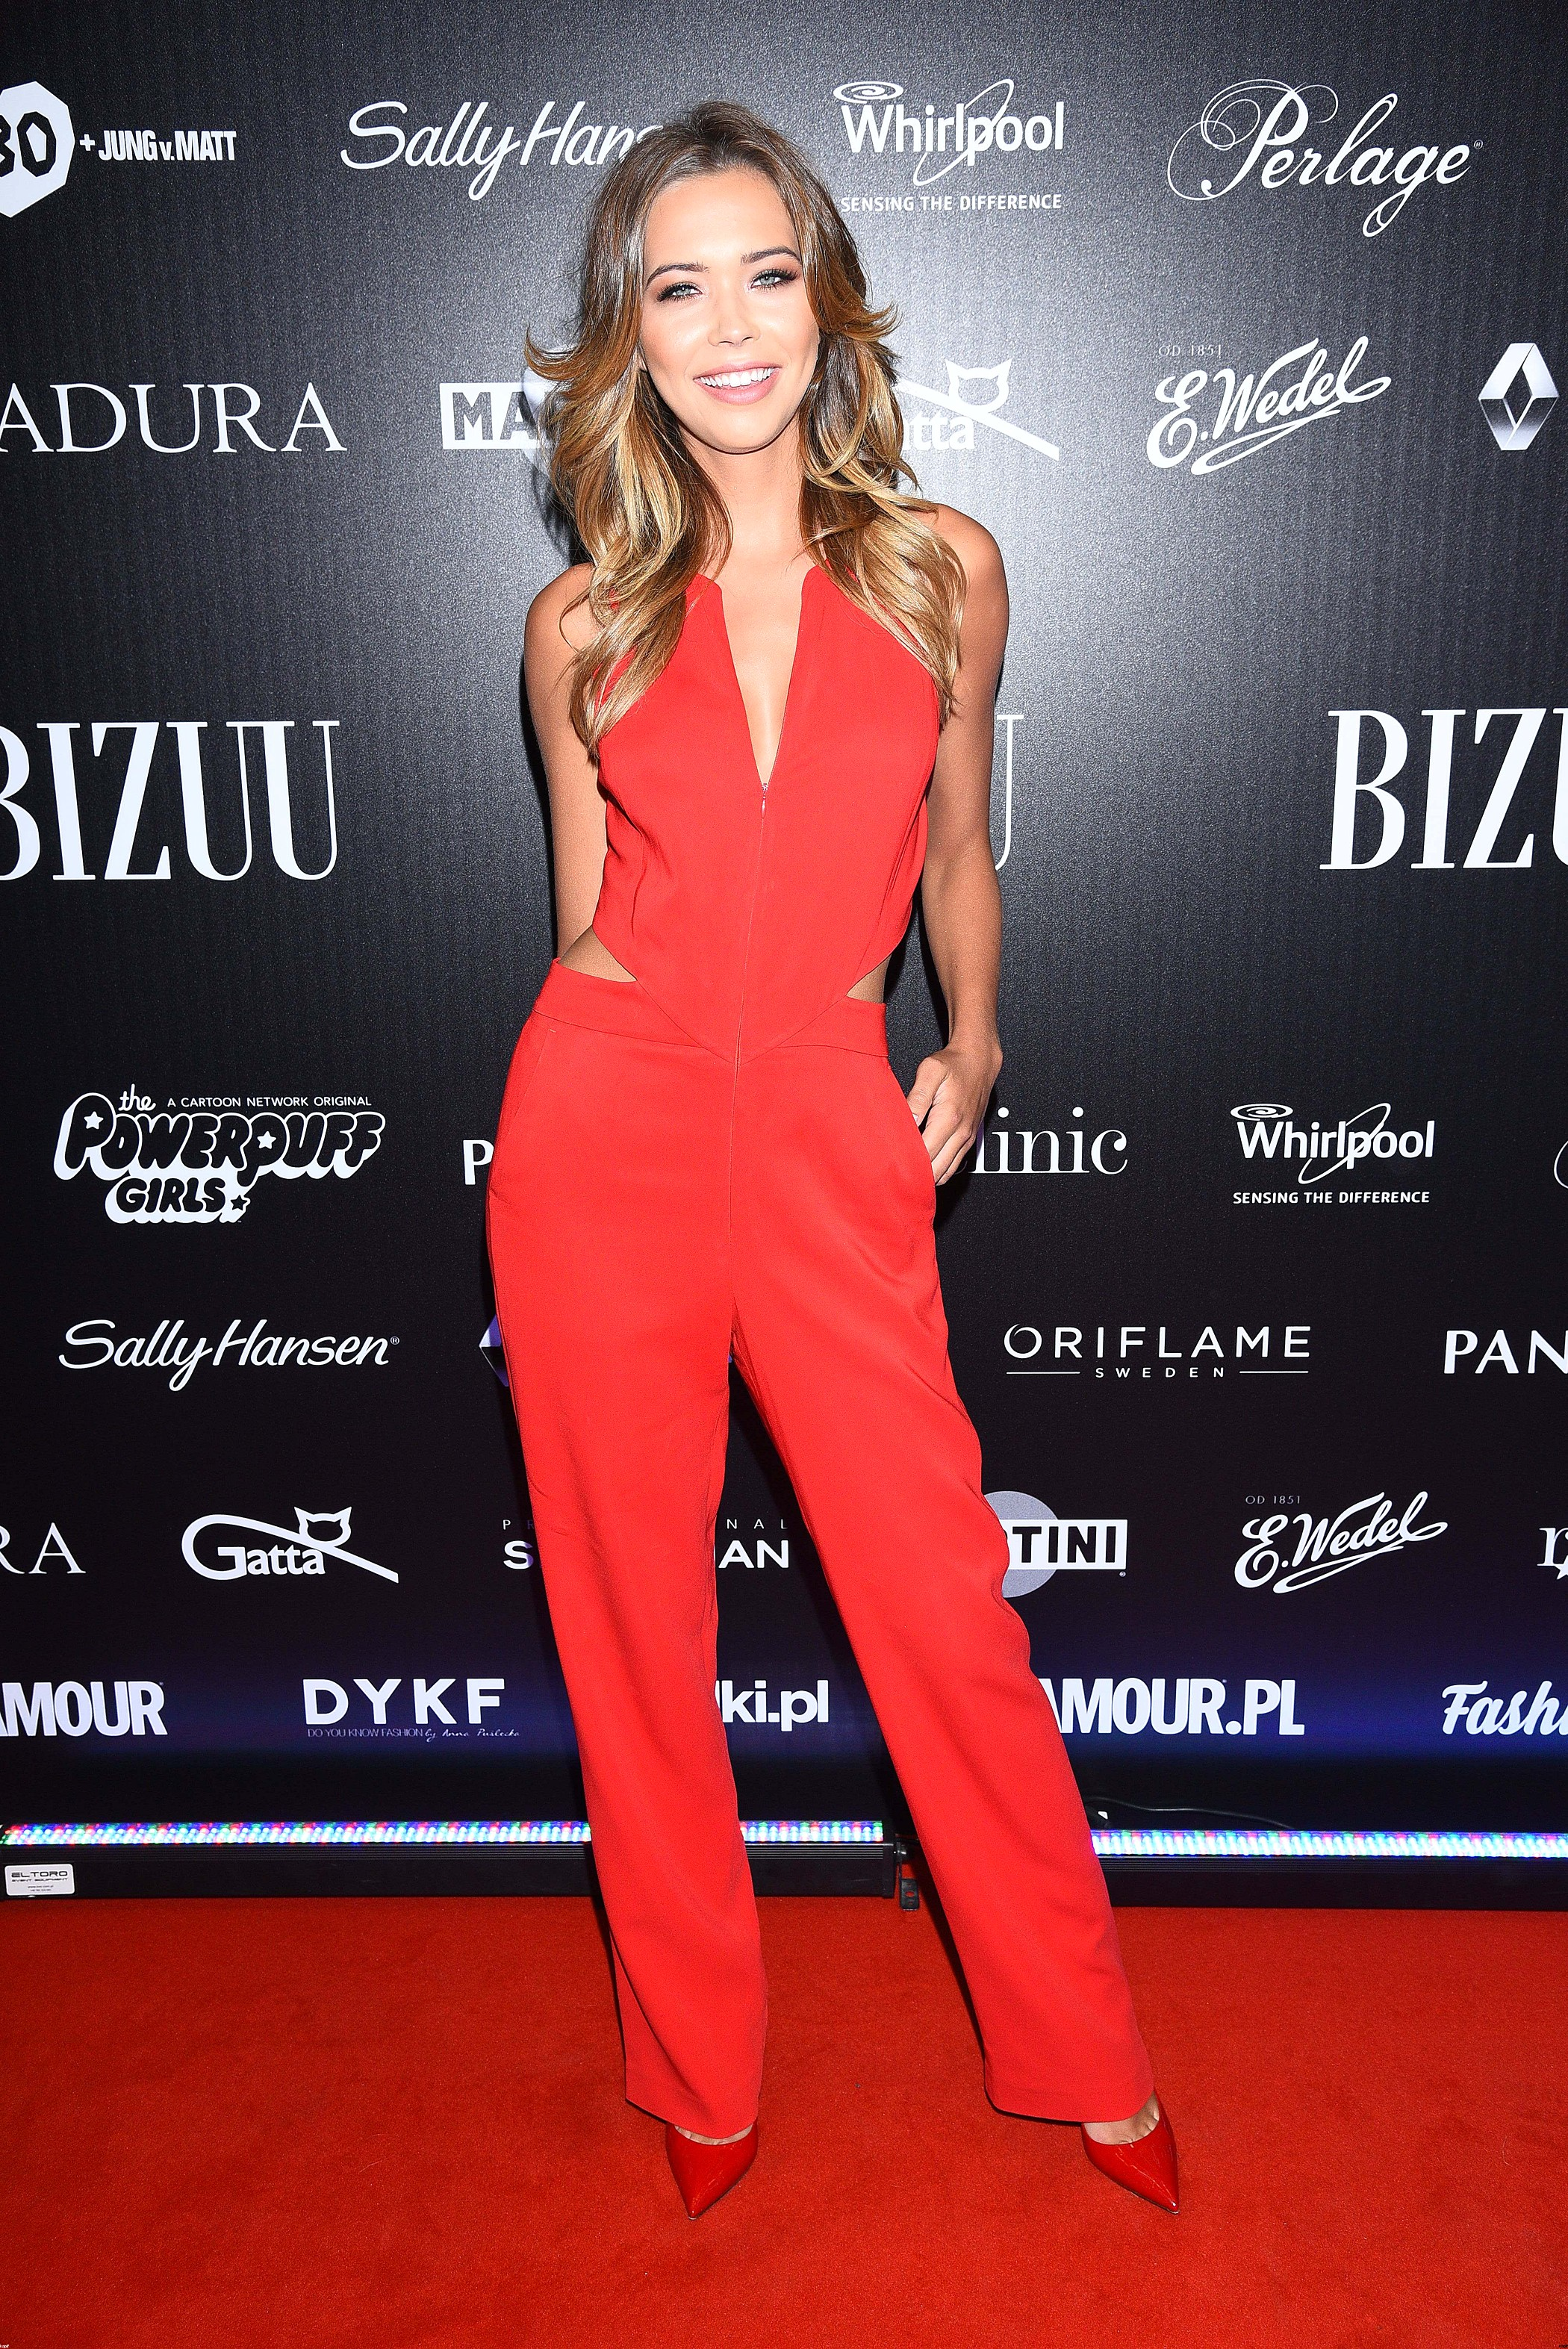 Sandra Kubicka - modelka Victoria's Secret na pokazie Bizuu